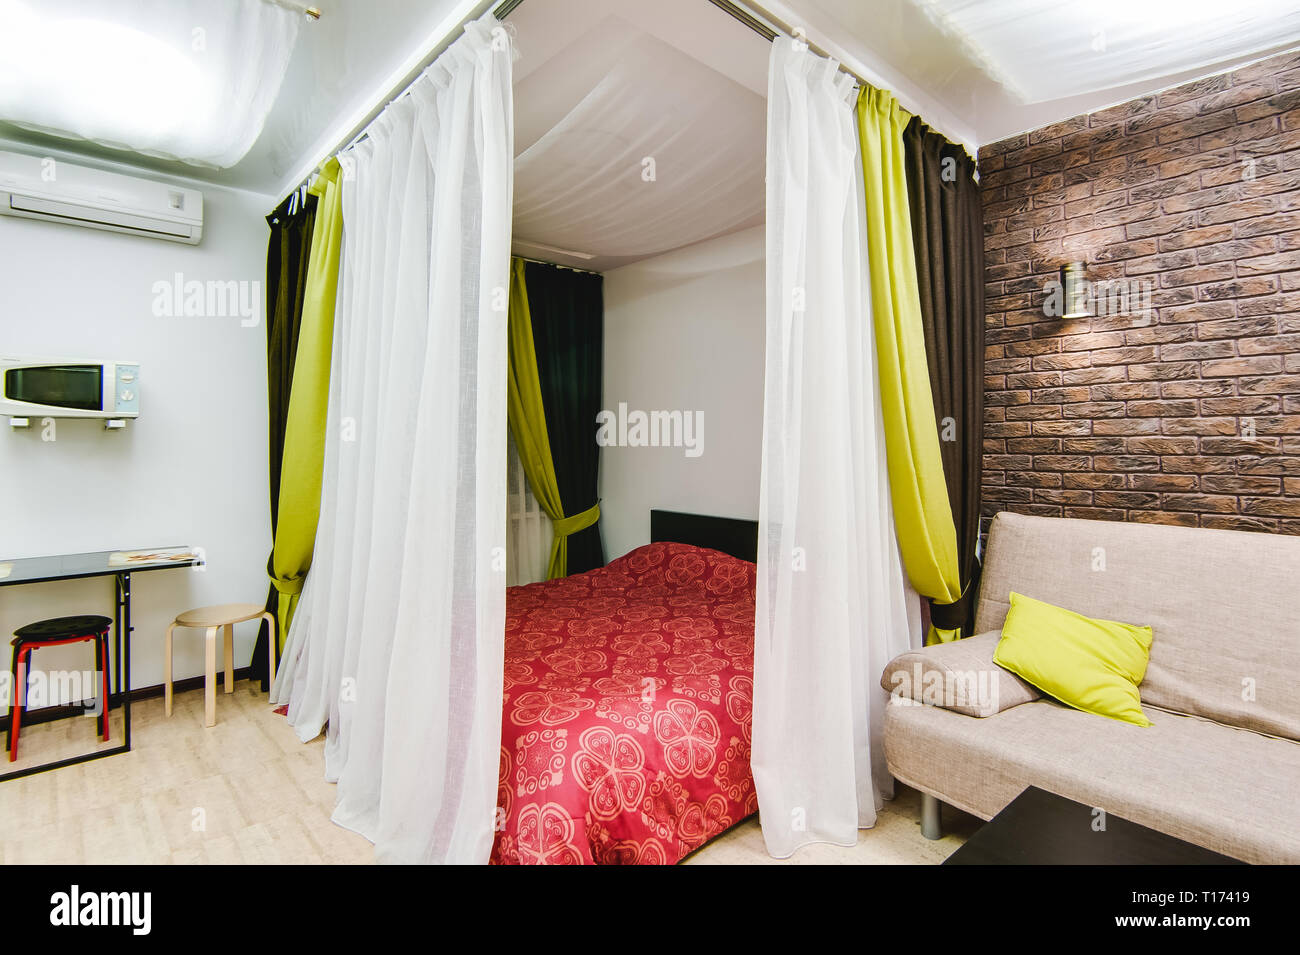 Russia Novosibirsk 12 December 2017 Interior Room Apartment Modern Small Cozy Studio Apartment Stock Photo Alamy